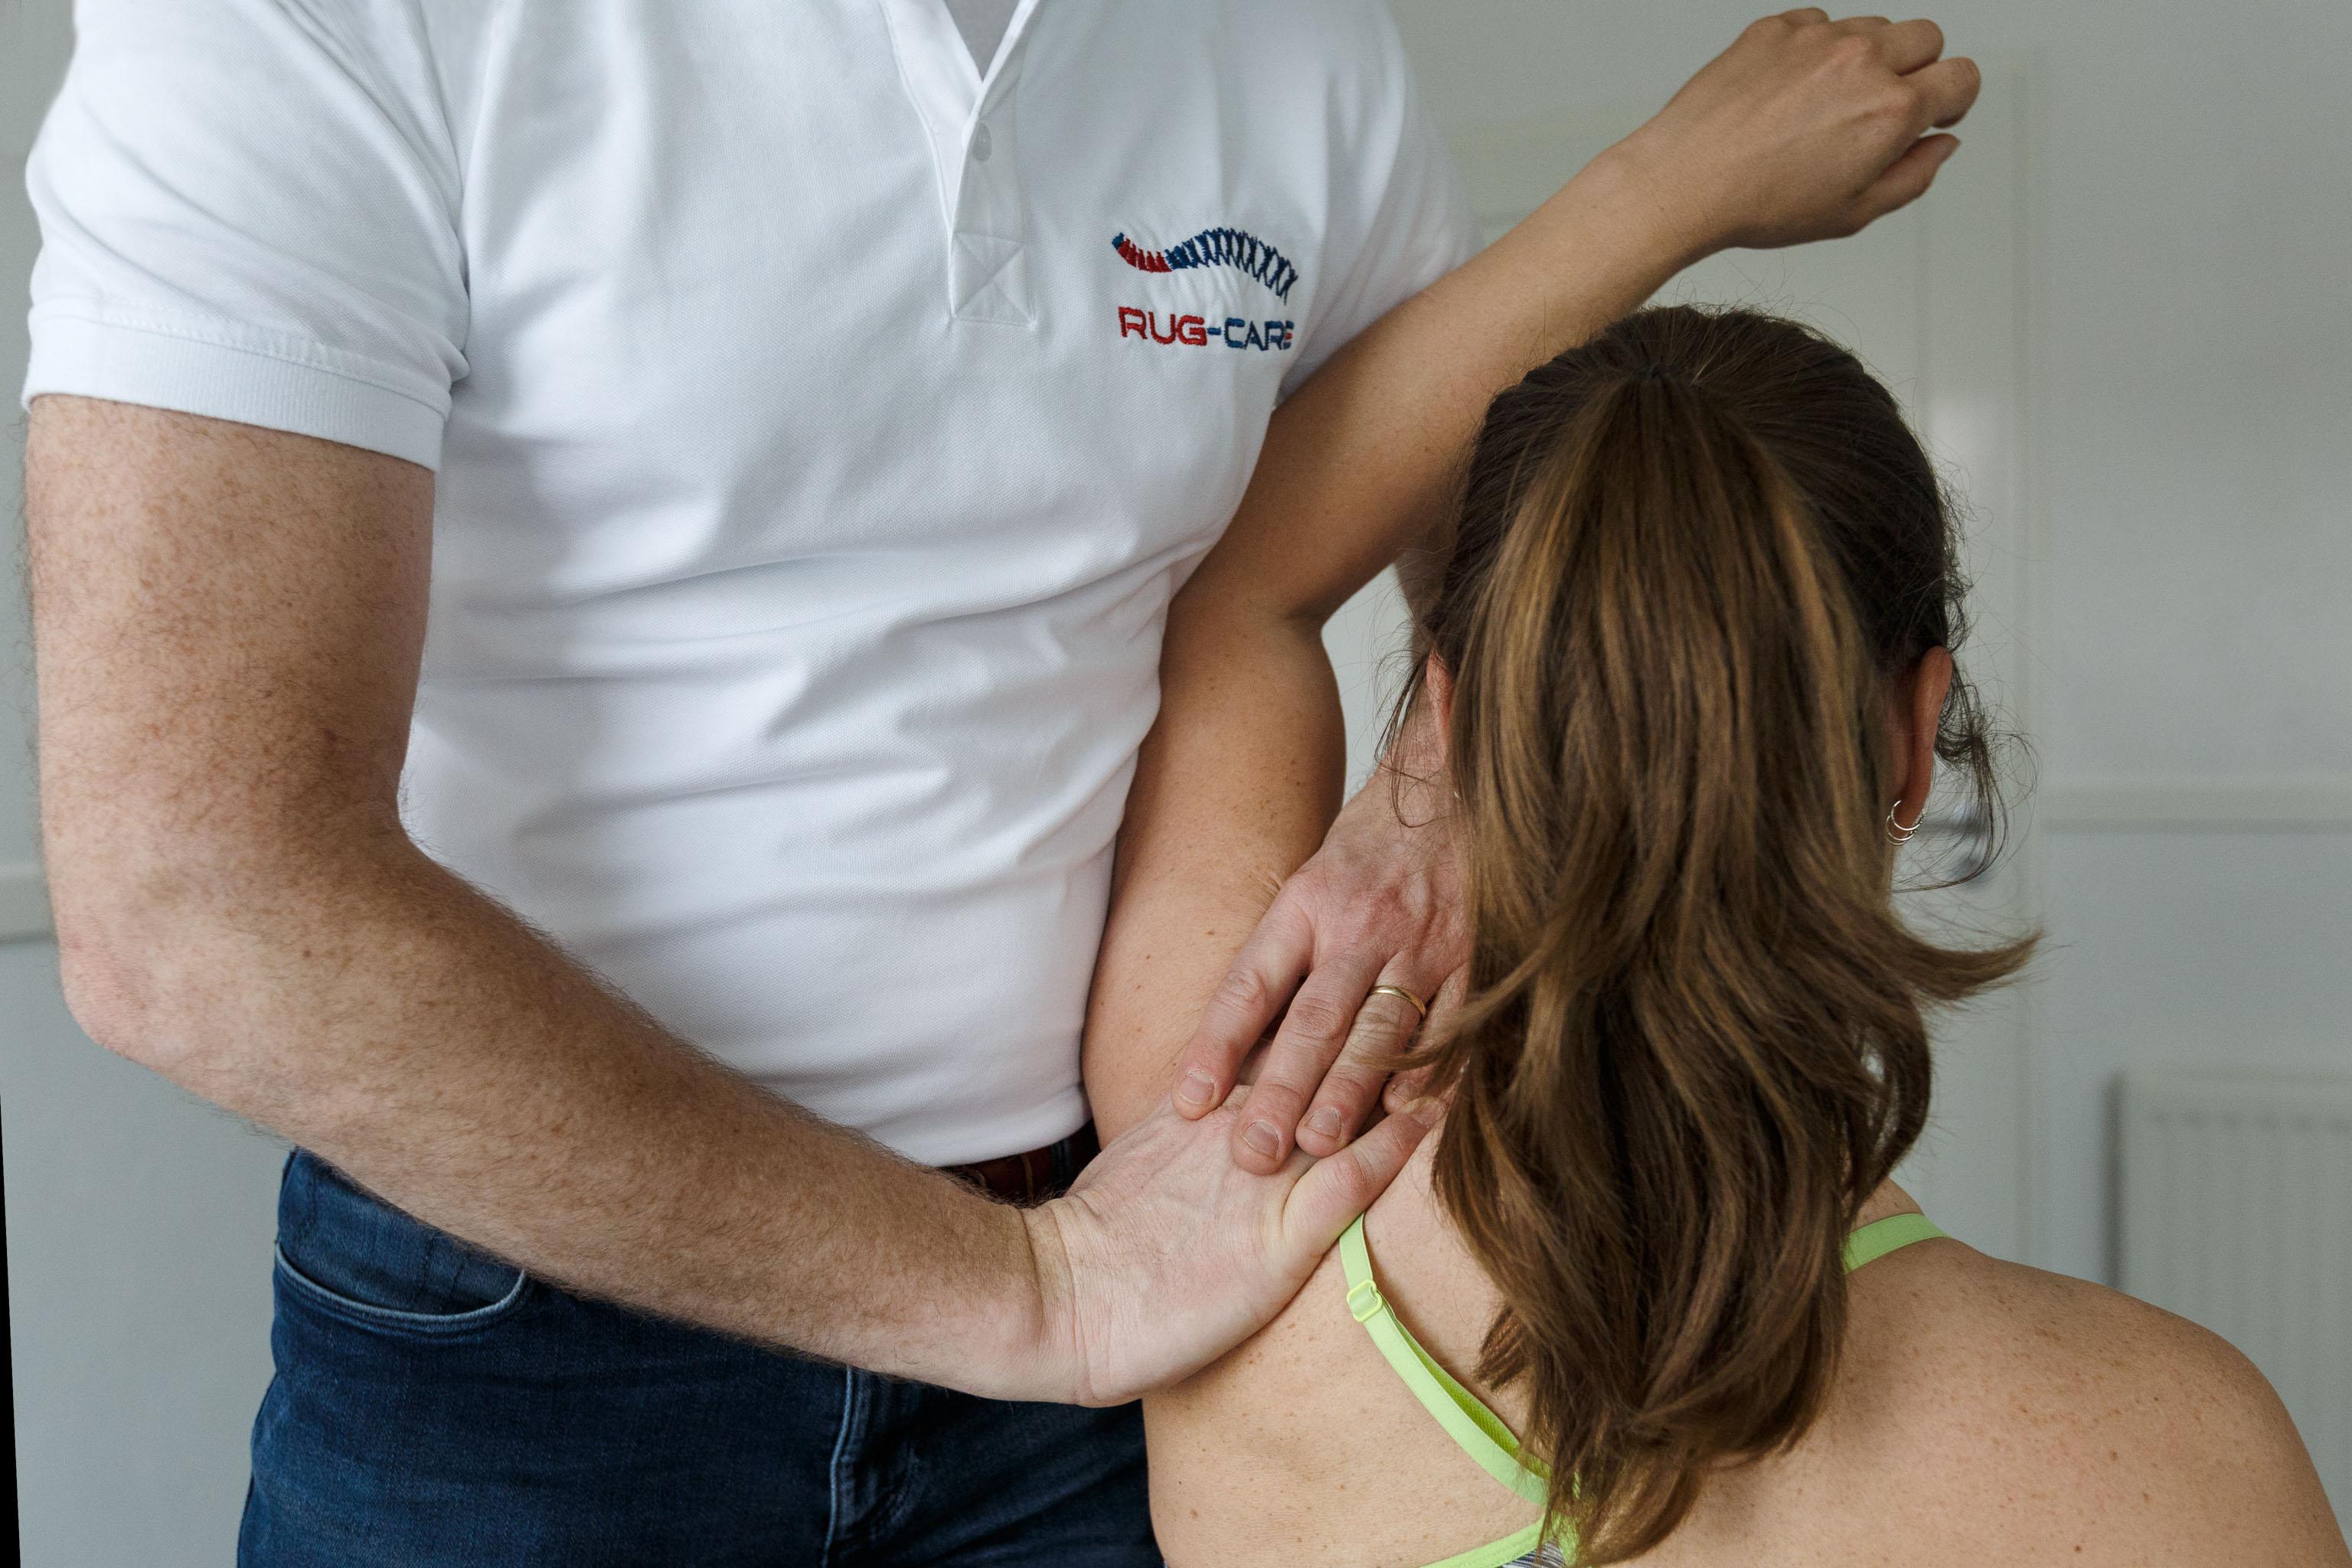 fysio, fysio Helmond, fysiobehandeling Helmond, fysiobehandeling, fysiopraktijk, fysiopraktijk Helmond, fysiotherapeut, fysiotherapeut Helmond, fysiotherapeuten, fysiotherapeuten Helmond, fysiotherapie, fysiotherapie helmond, fysiotherapiebehandeling, fysiotherapiebehandeling helmond, fysiotherapiepraktijk, fysiotherapiepraktijk helmond, rugklachten, rugklachten helmond, rugpijn, rugpijn helmond, schouderklachten, schouderklachten helmond, schouderpijn, schouderpijn helmond, rugklachten, rugpijn, rugklachten helmond, rugpijn helmond, nekklachten, nekklachten helmond, nekpijn, nekpijn helmond, nekklachten, nekklachten helmond